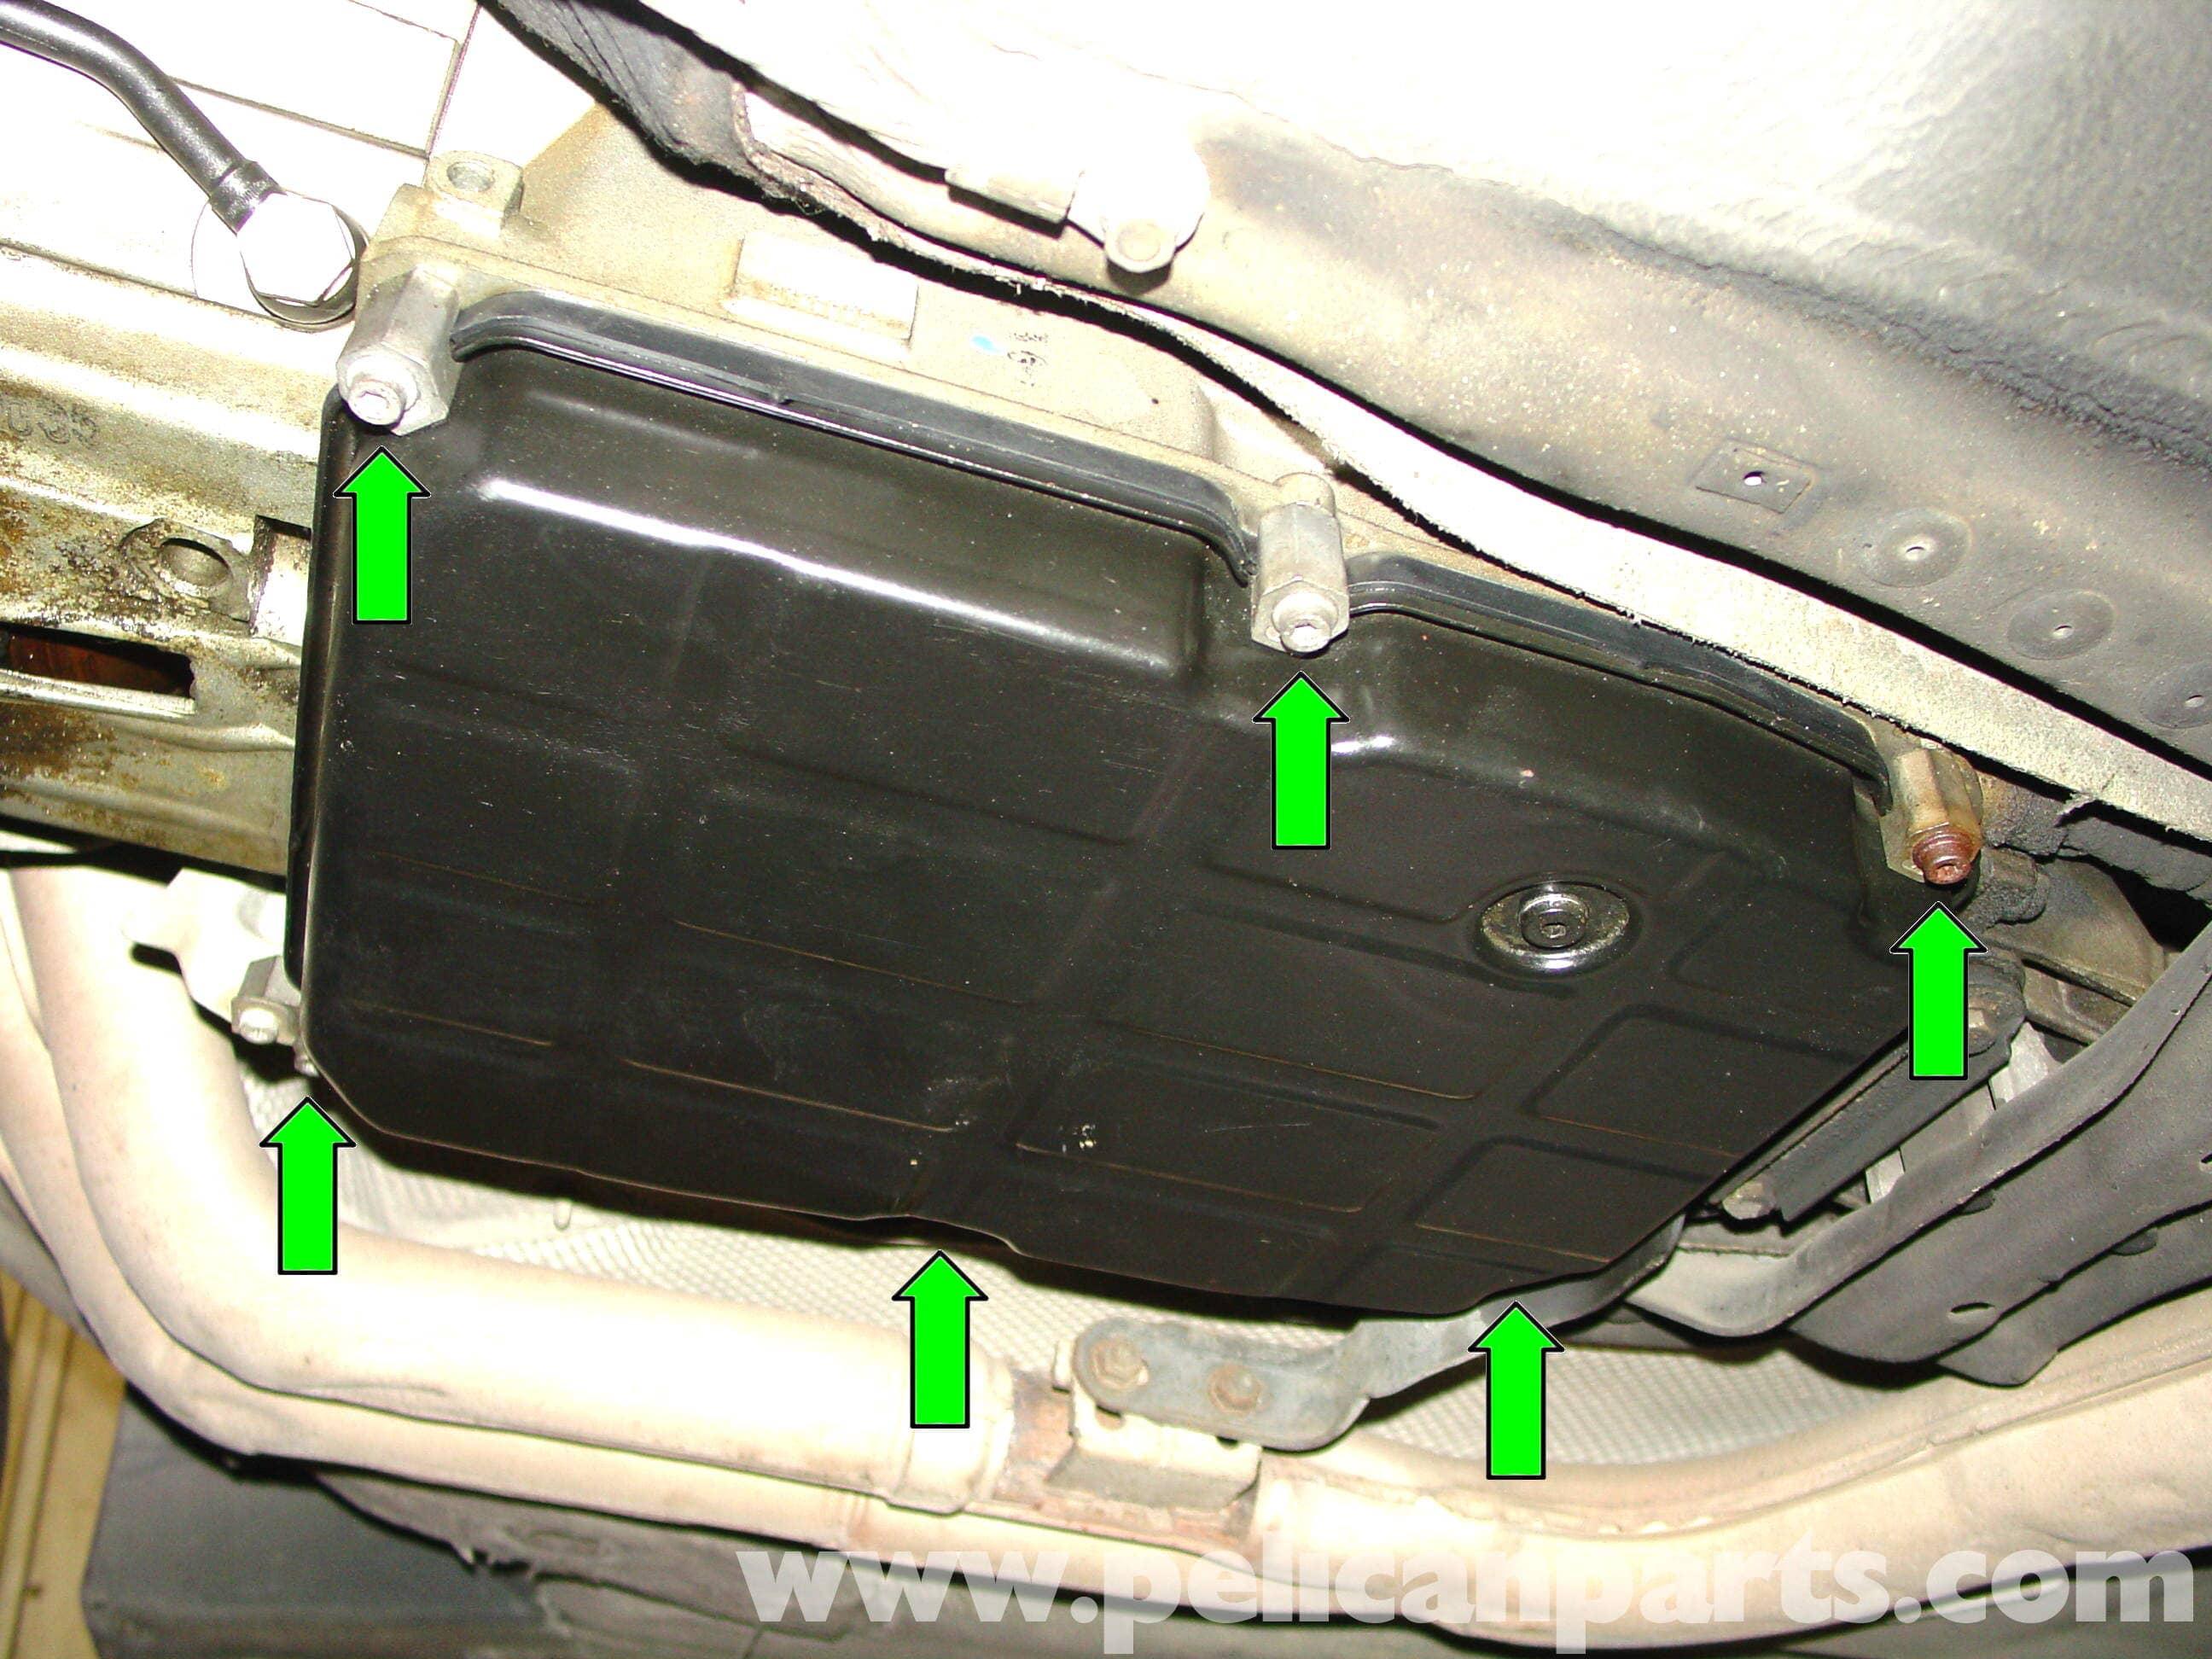 MercedesBenz Automatic Transmission Fluid Change W210 199603